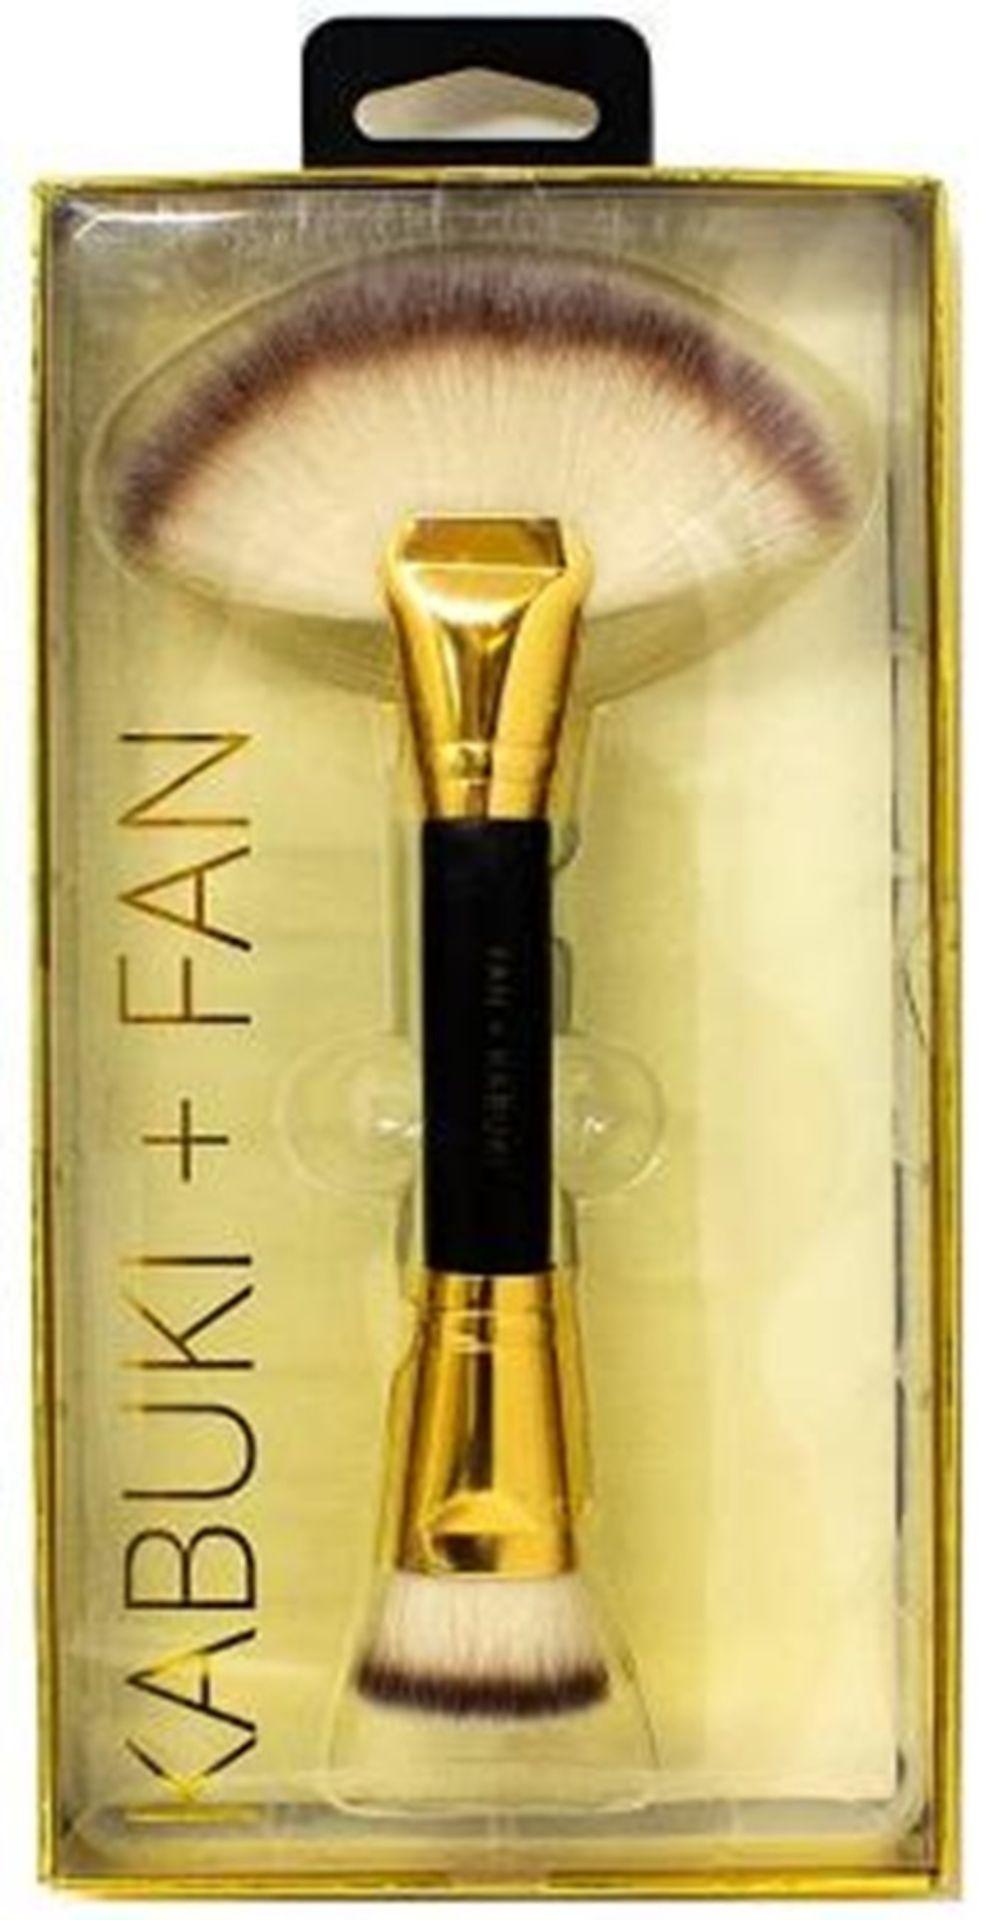 100 x Dual End Kabuki & Fan Make-Up Brush | Total RRP £999